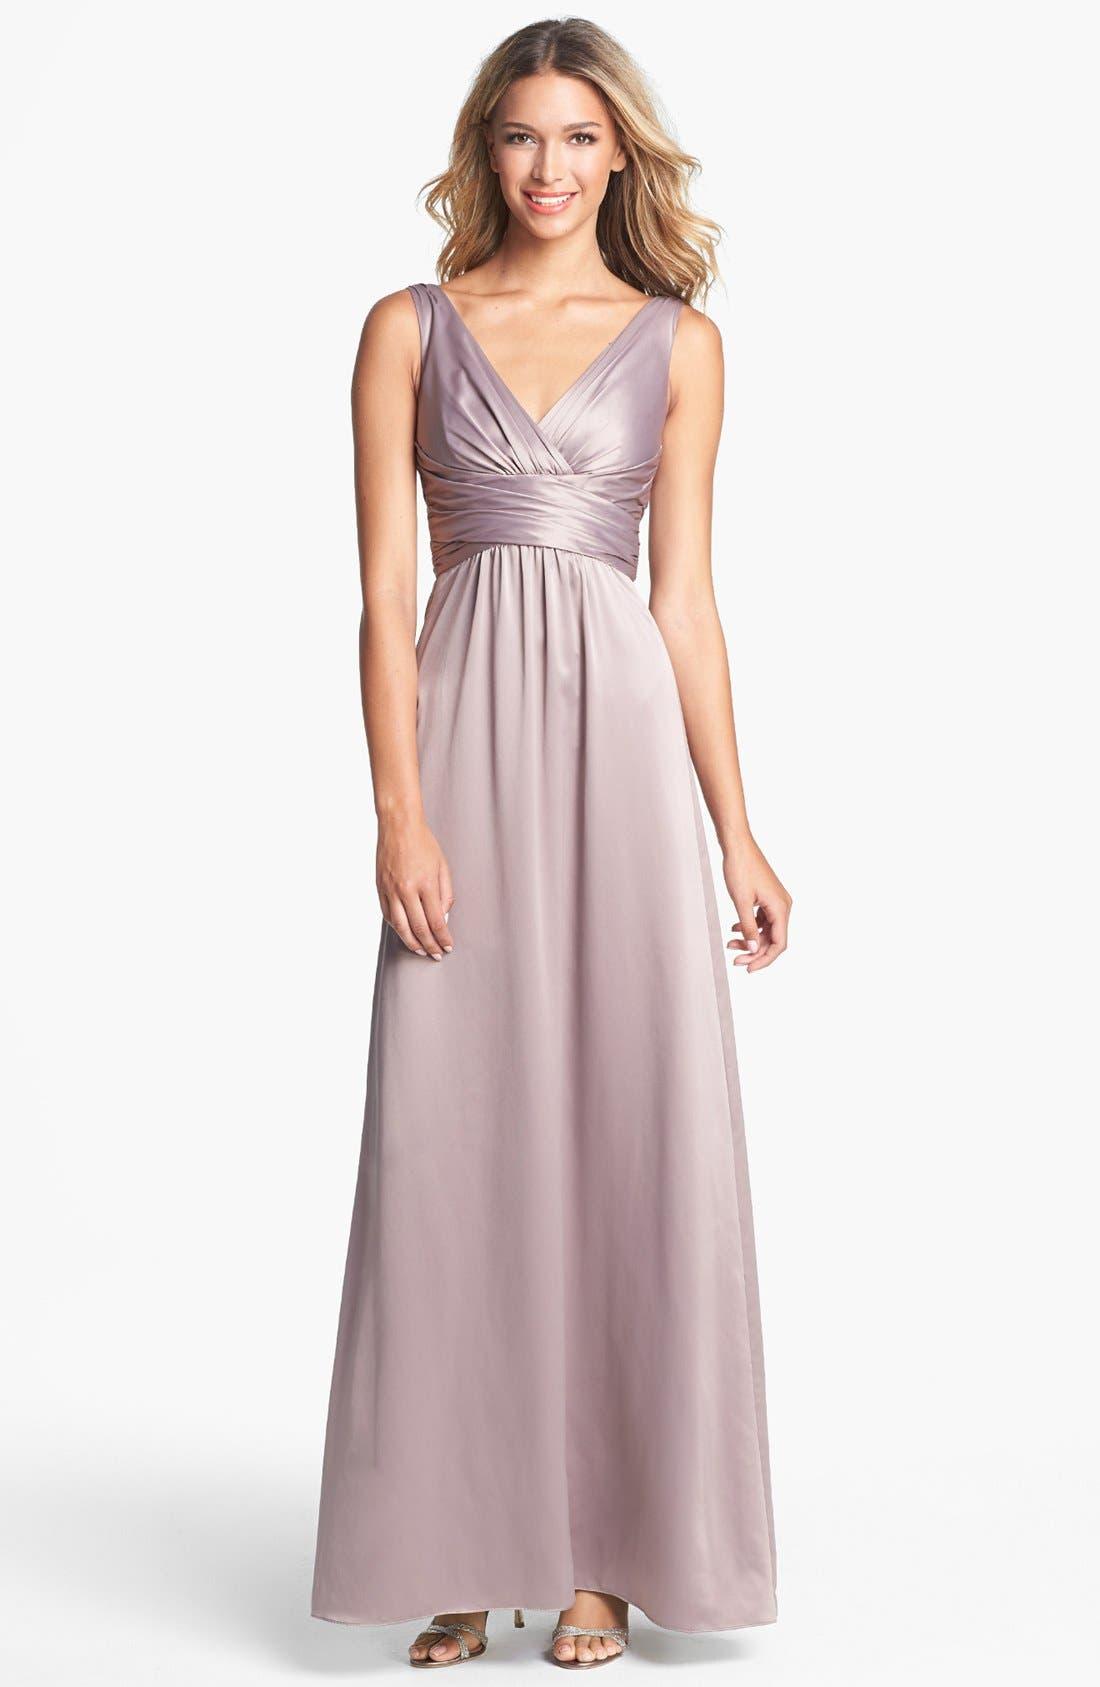 Main Image - Amsale Long Charmeuse Dress